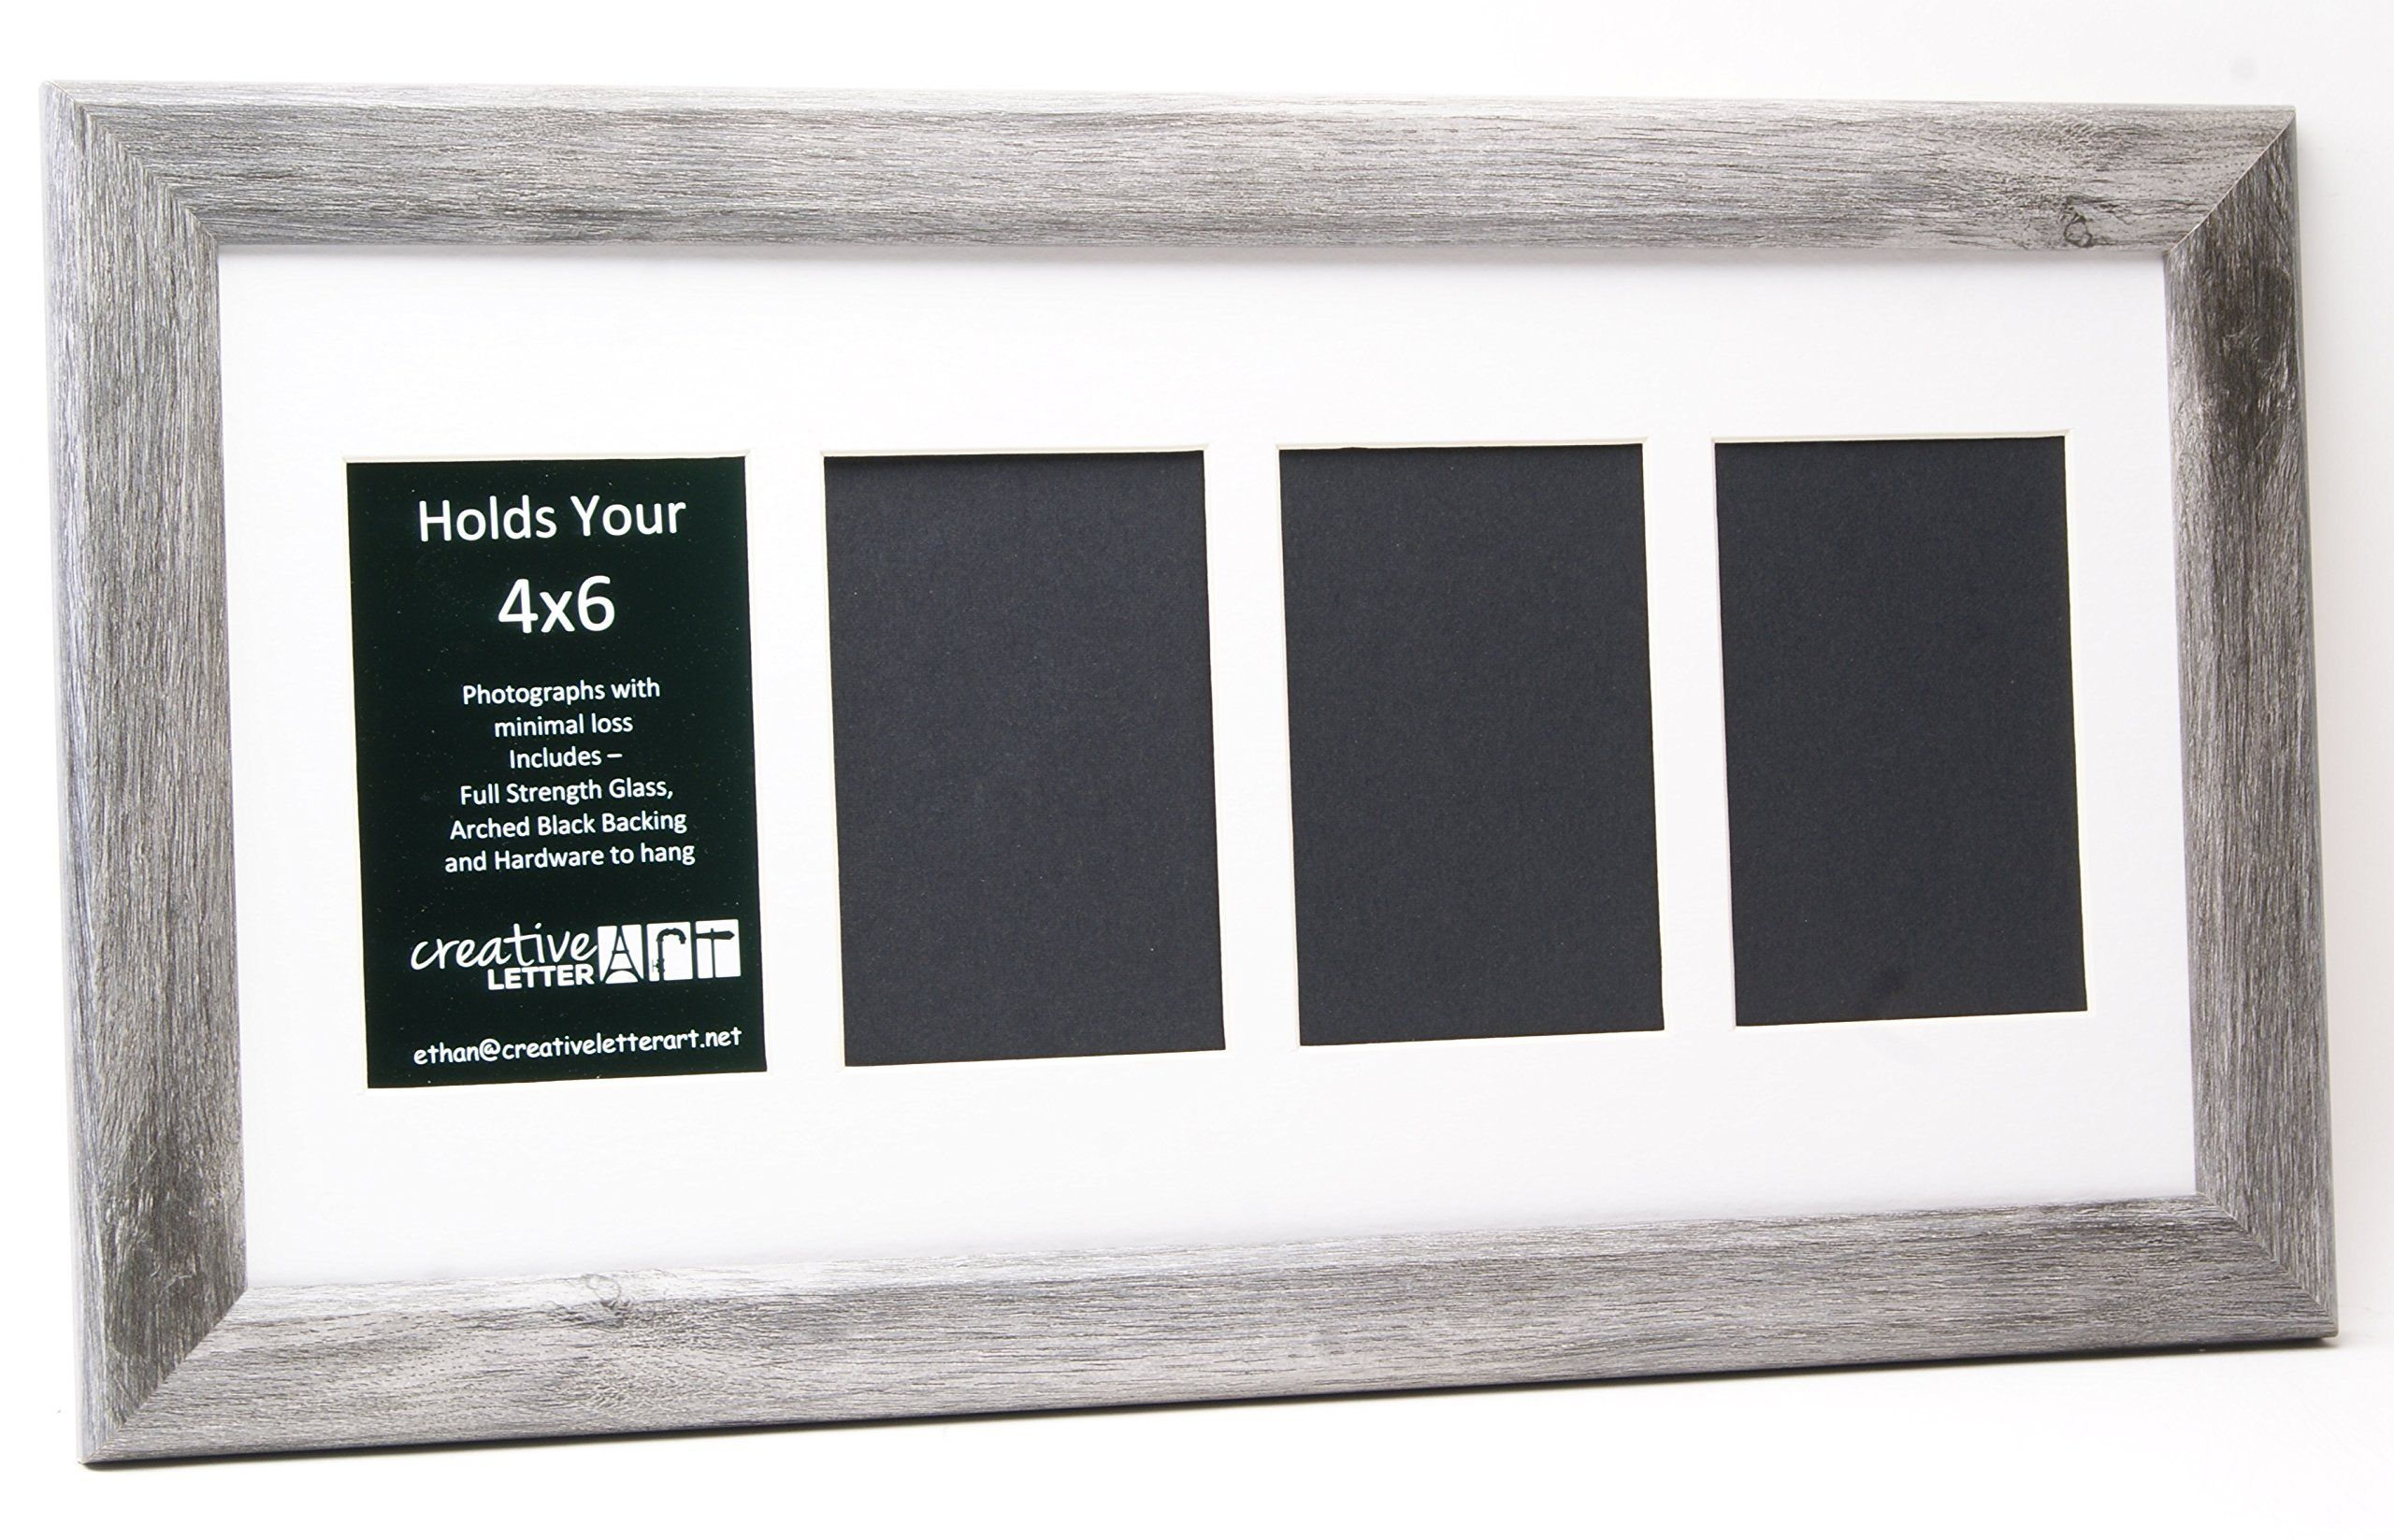 Robot Check Frame Lettering Picture Frames